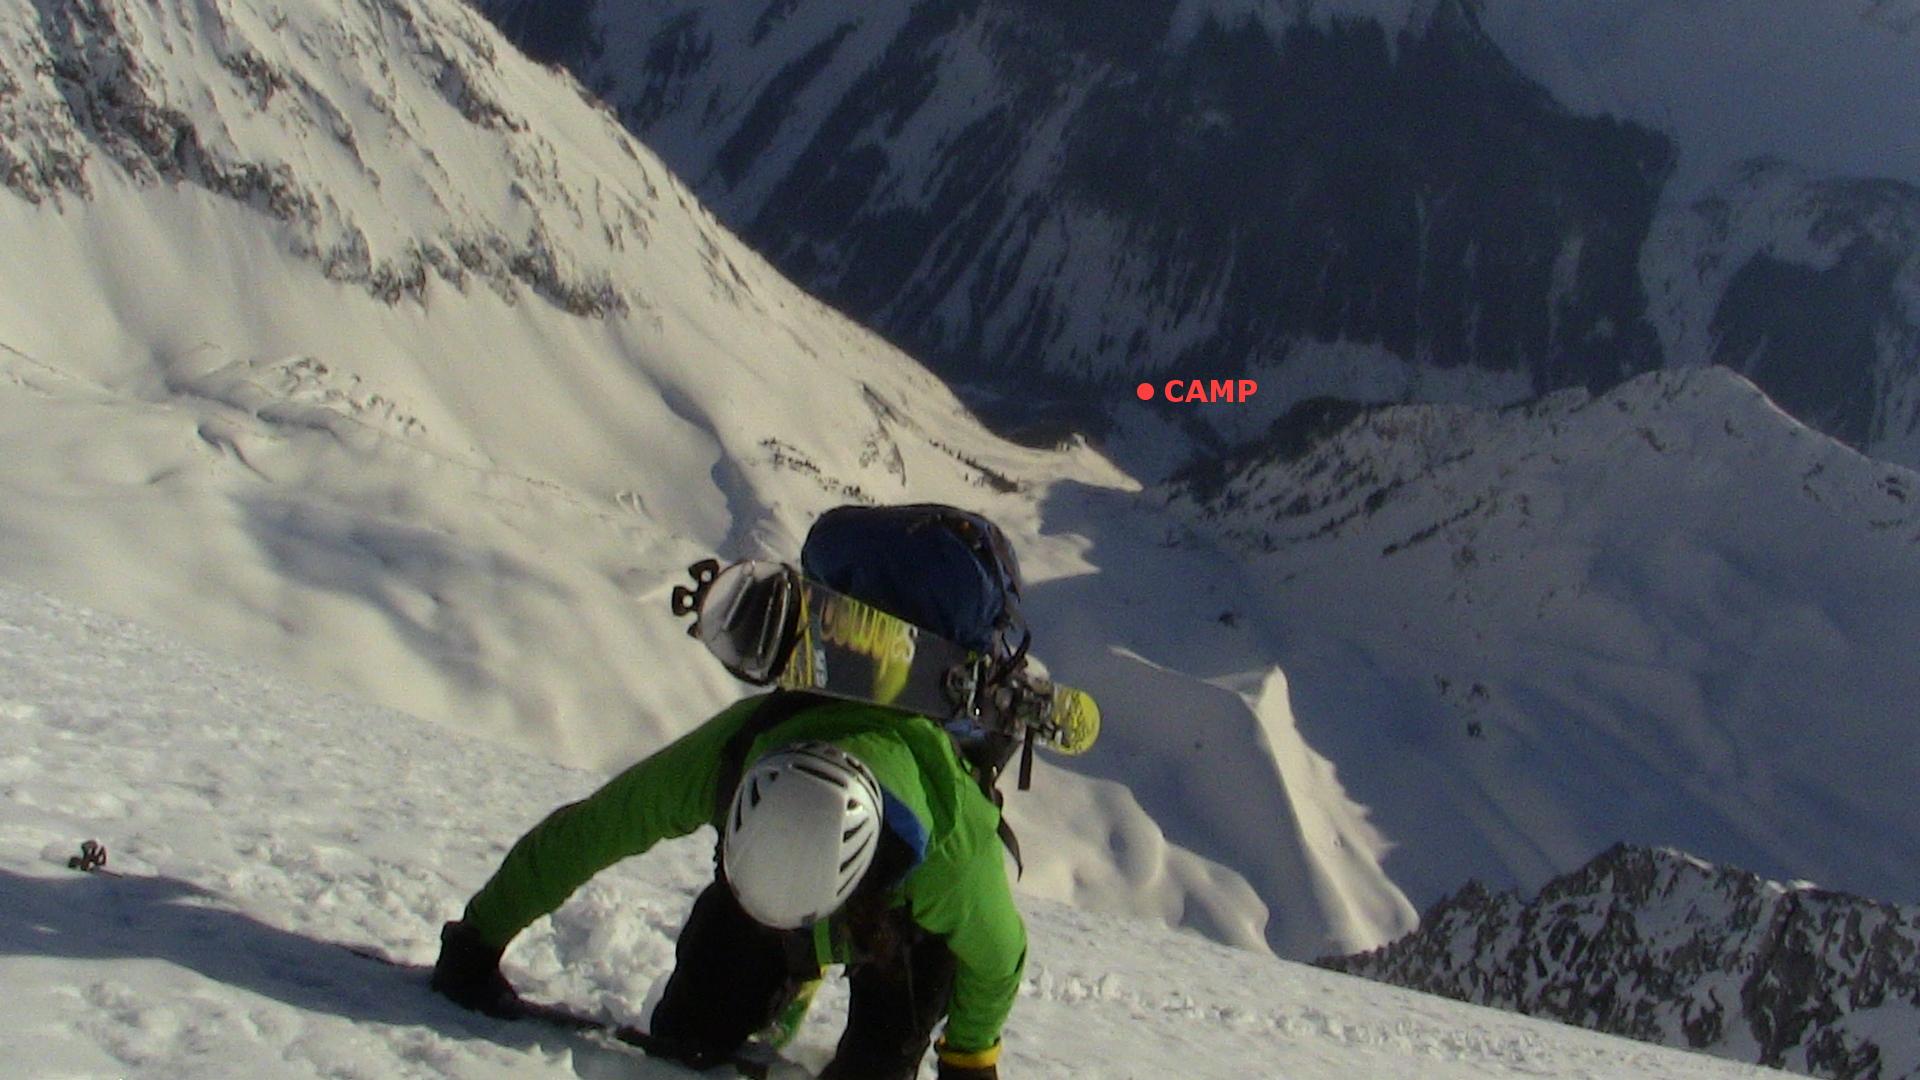 Camp, 7000 feet below